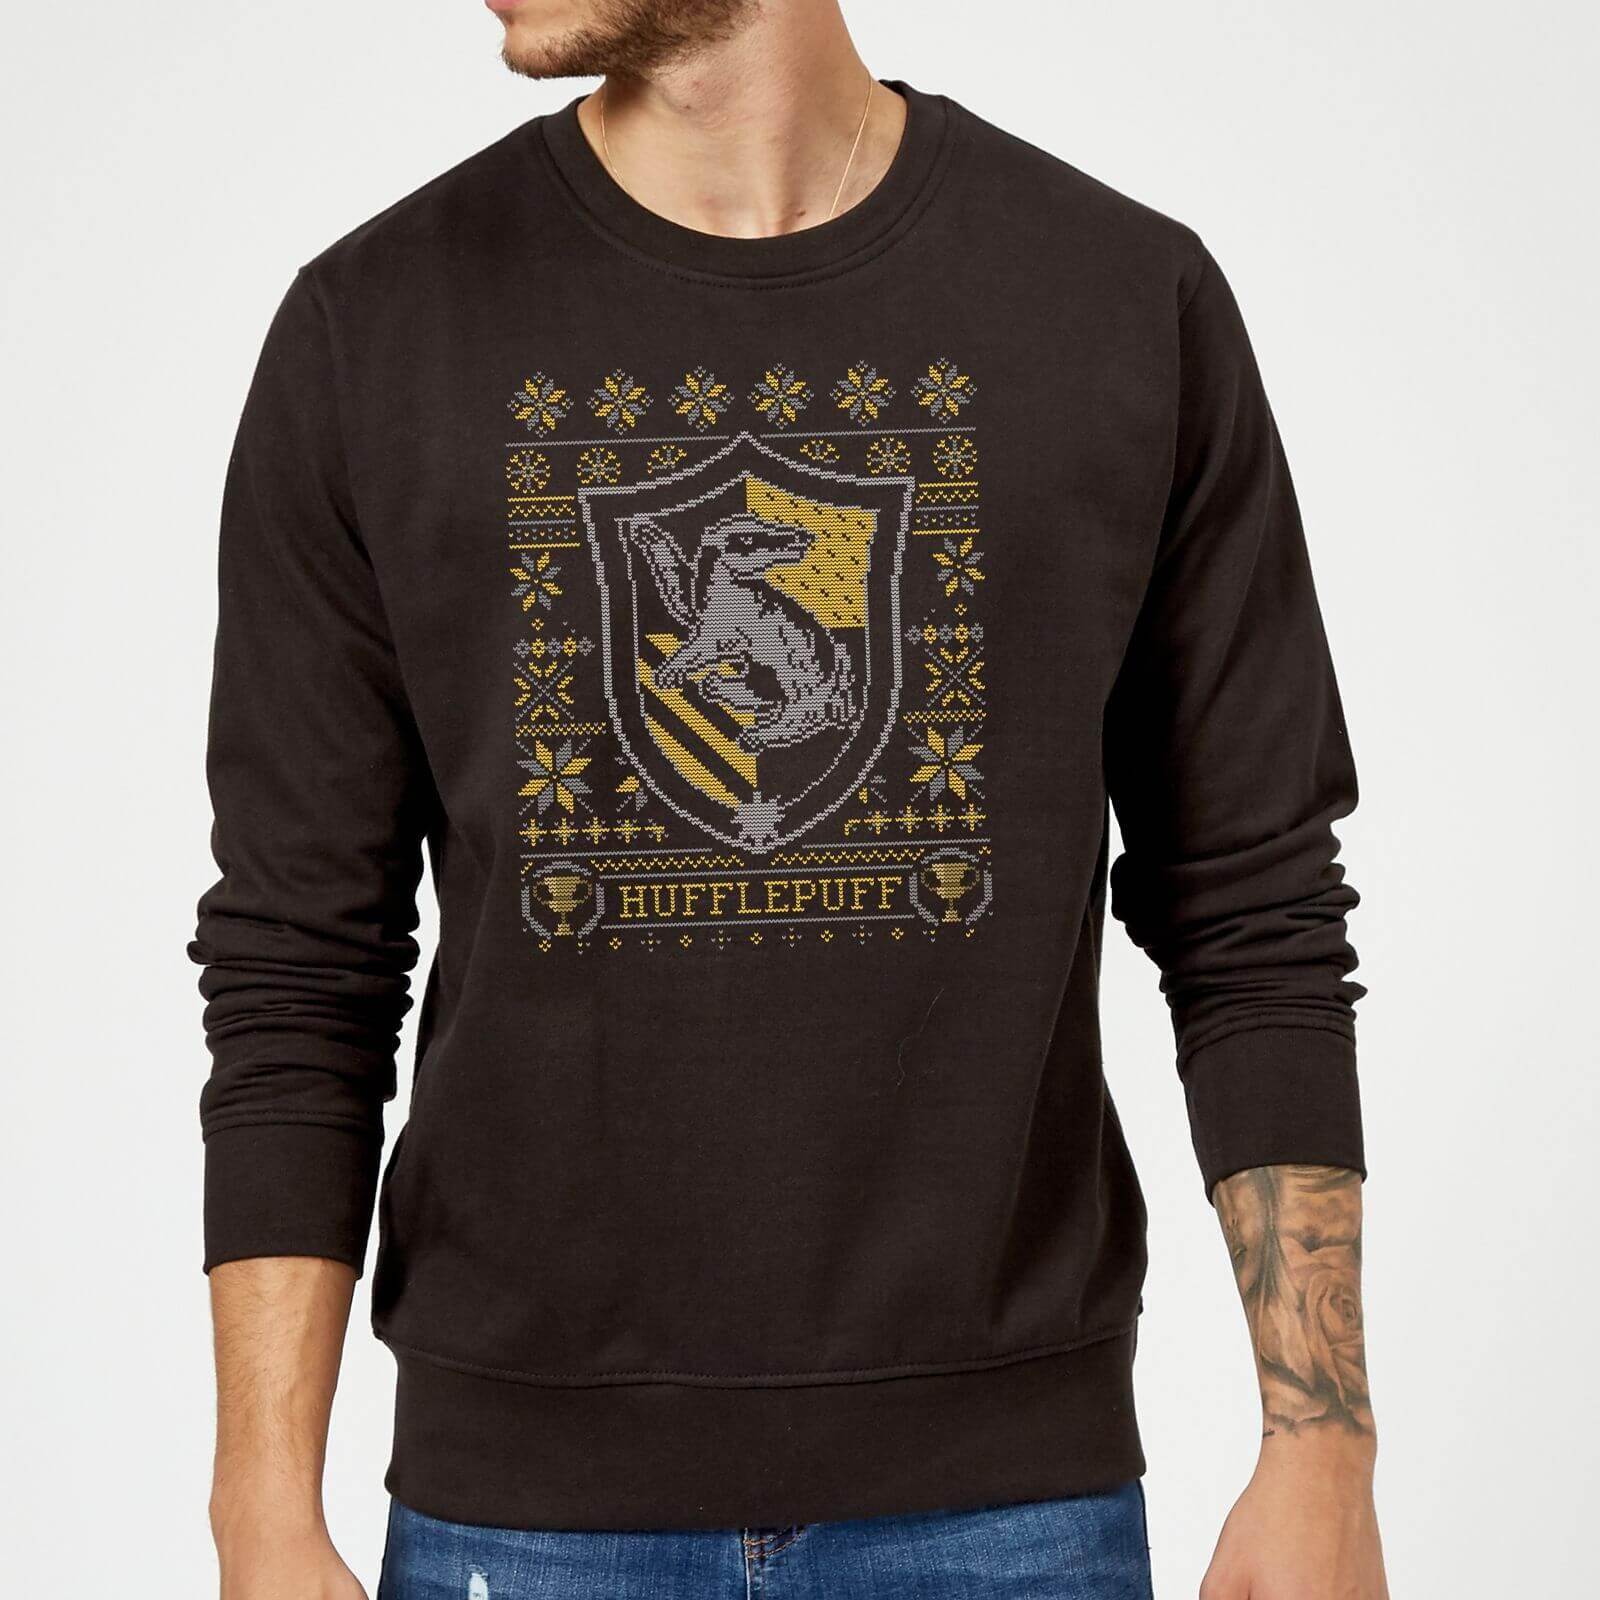 Harry Potter Hufflepuff Crest Christmas Sweater - Black - S - Black